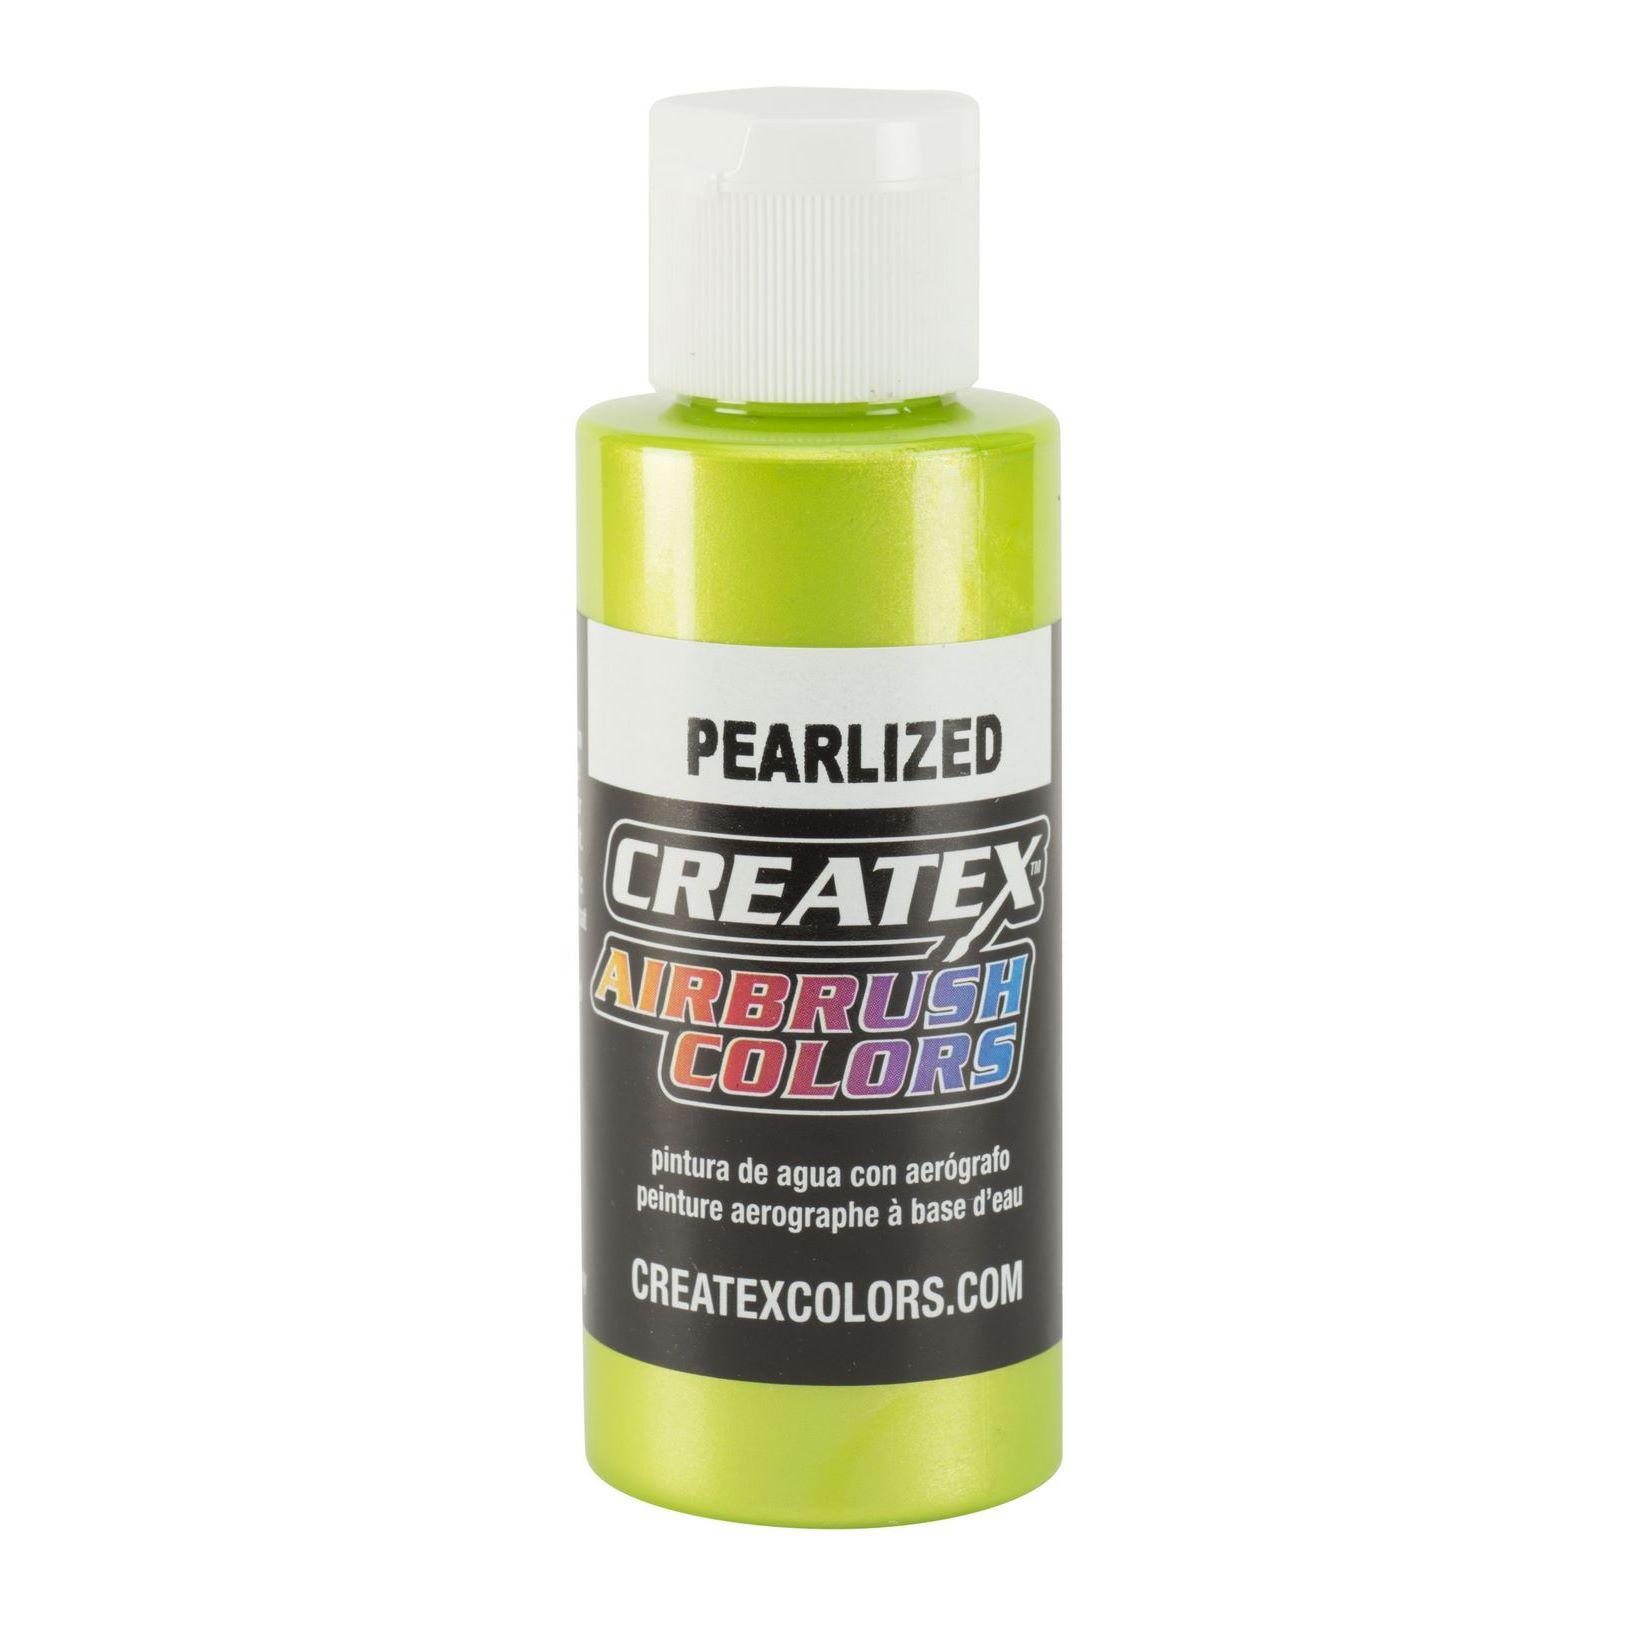 pearl Lime Createx Airbrush Colors Farbe 120ml 12 5313 Createx